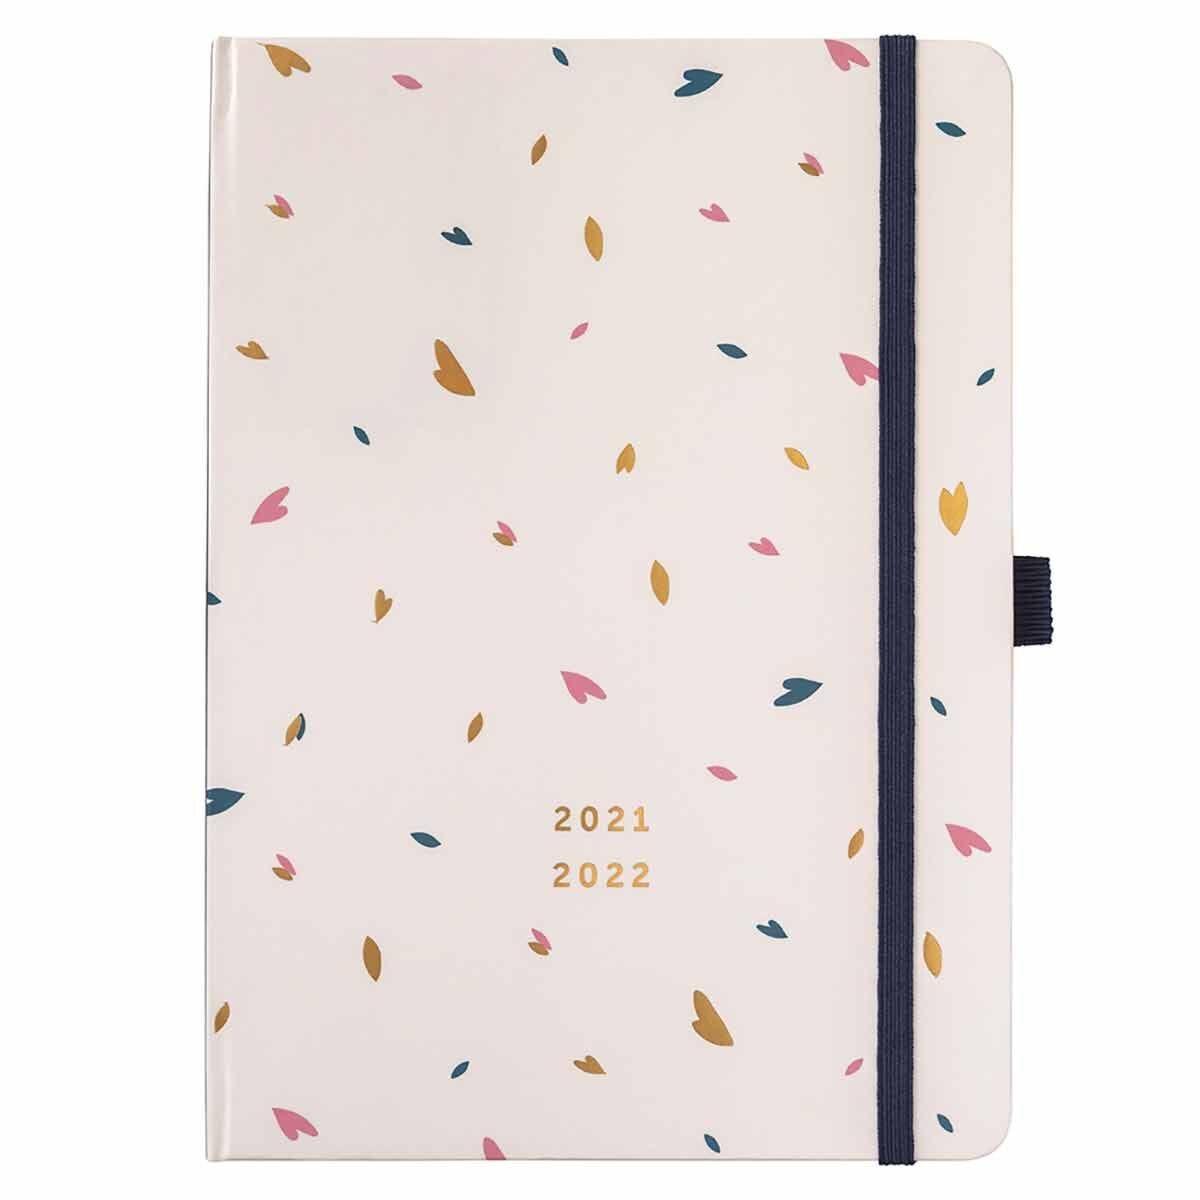 Busy B Mid-Year Busy Life Diary Pretty 2021